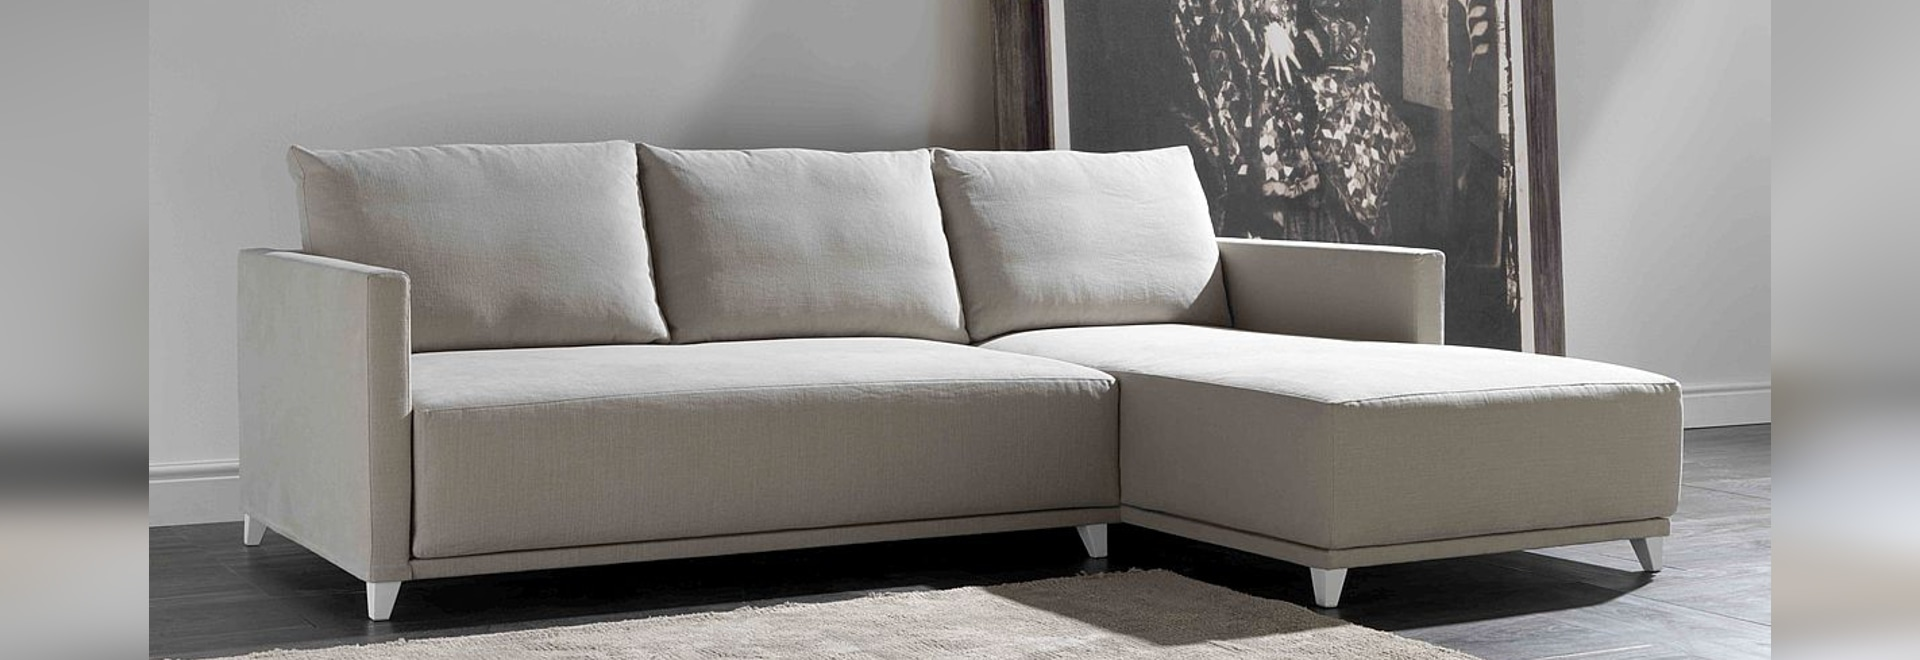 Sofá moderno Noname, nueva llegada en casa Santambrogio Sofas